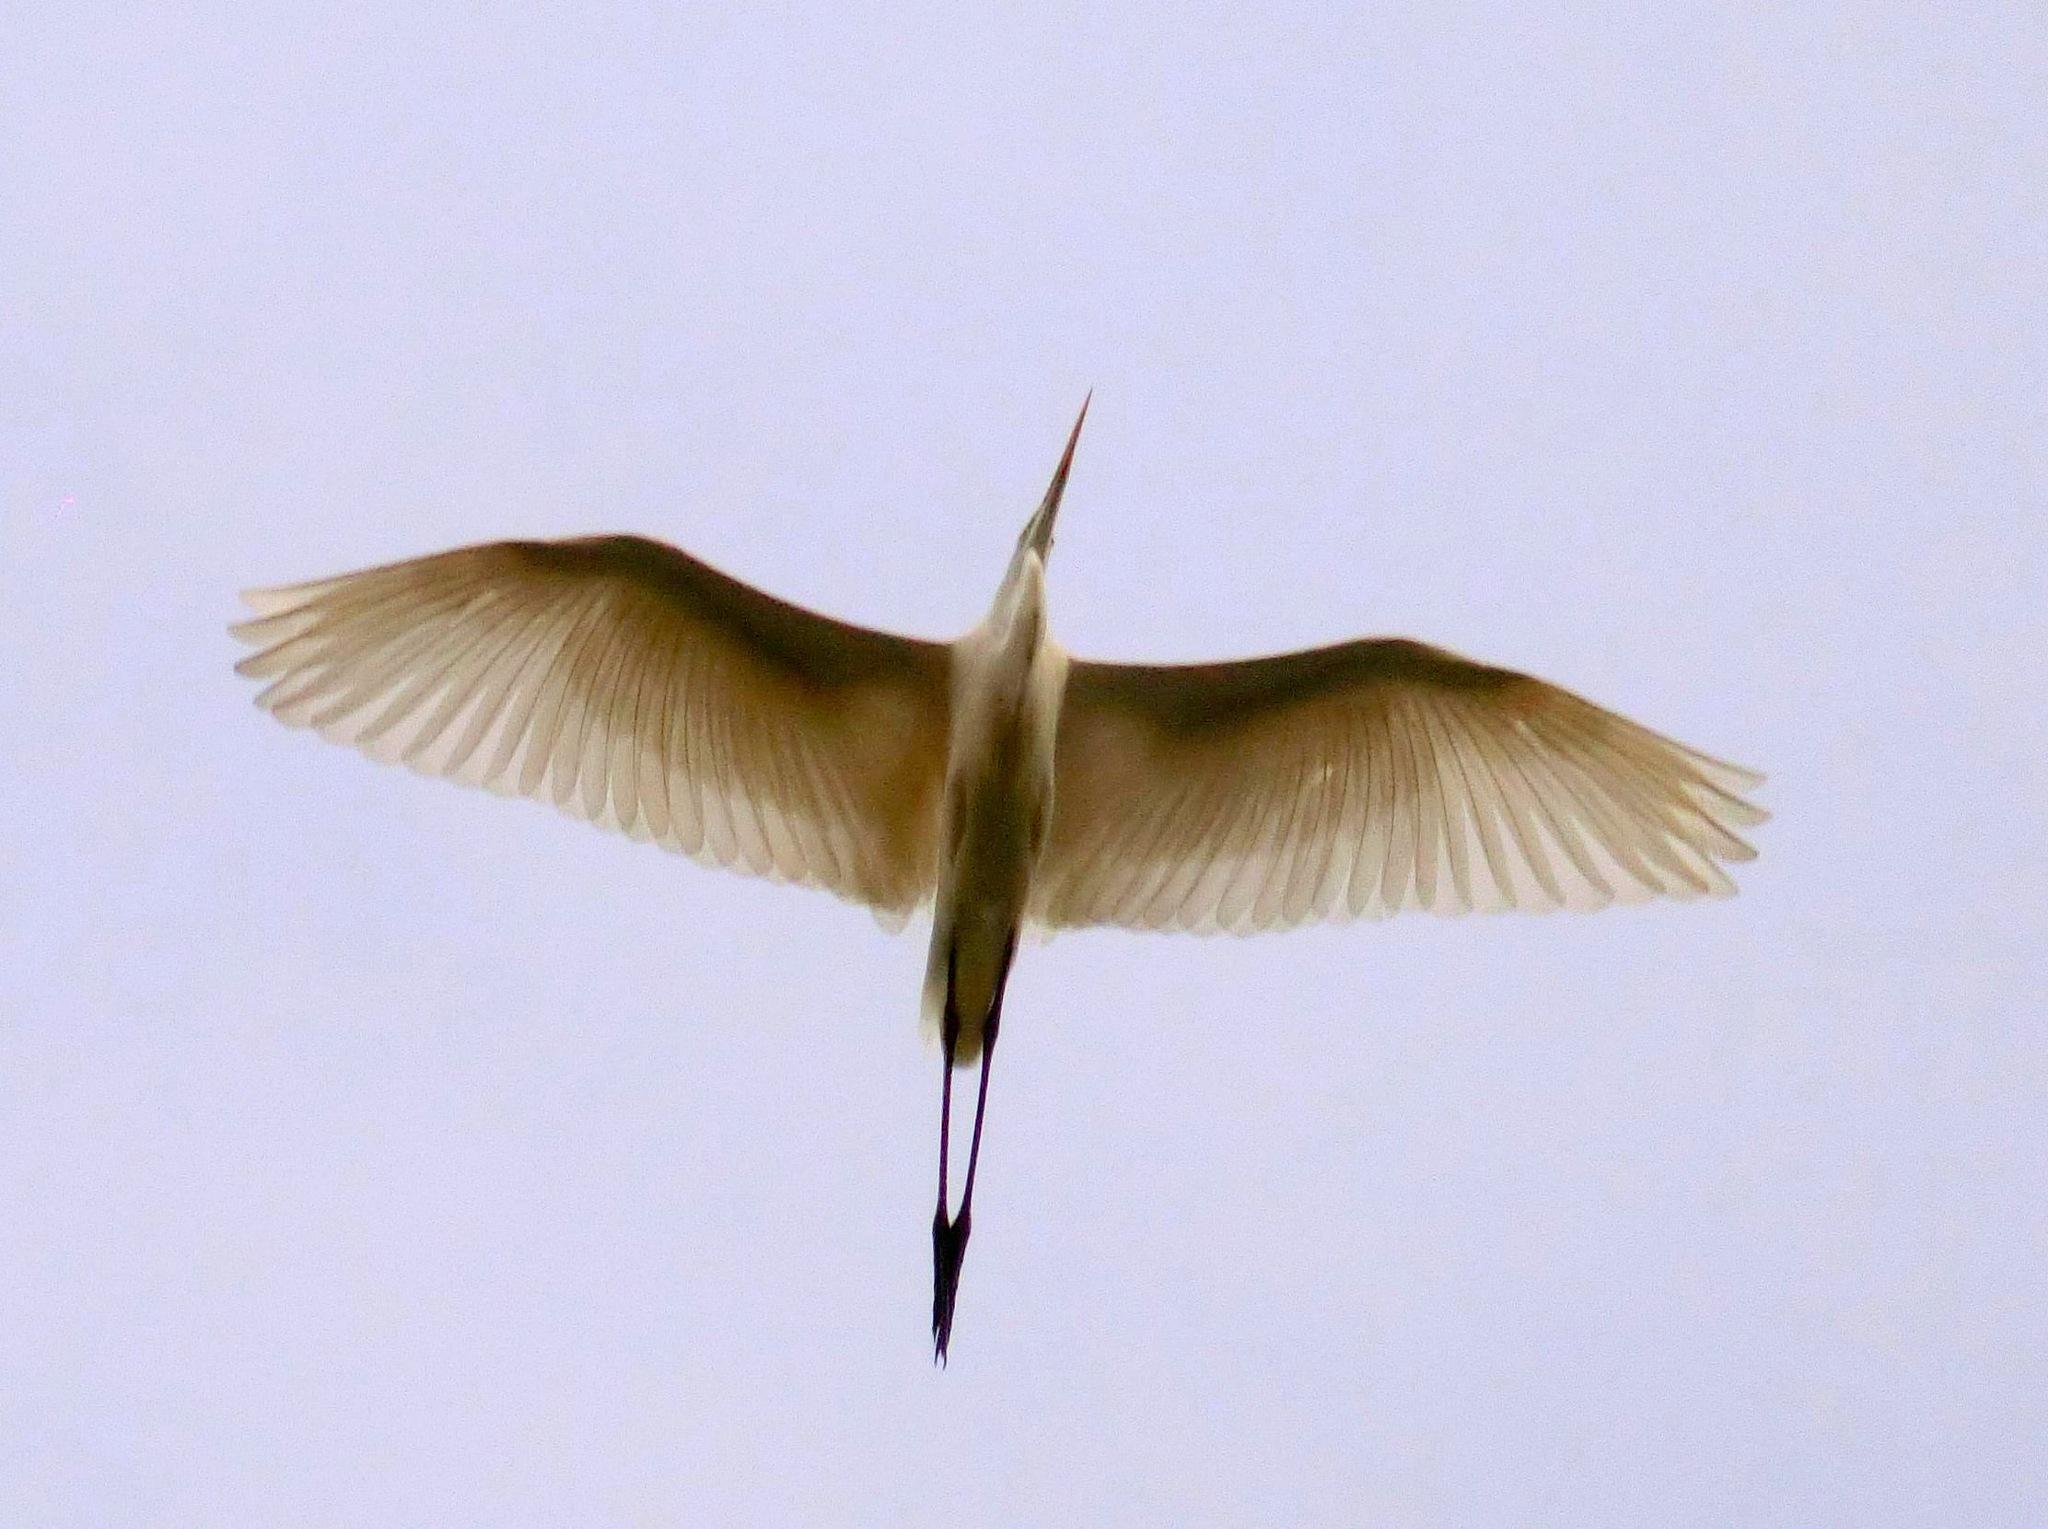 Flying Great Egret by pop88123